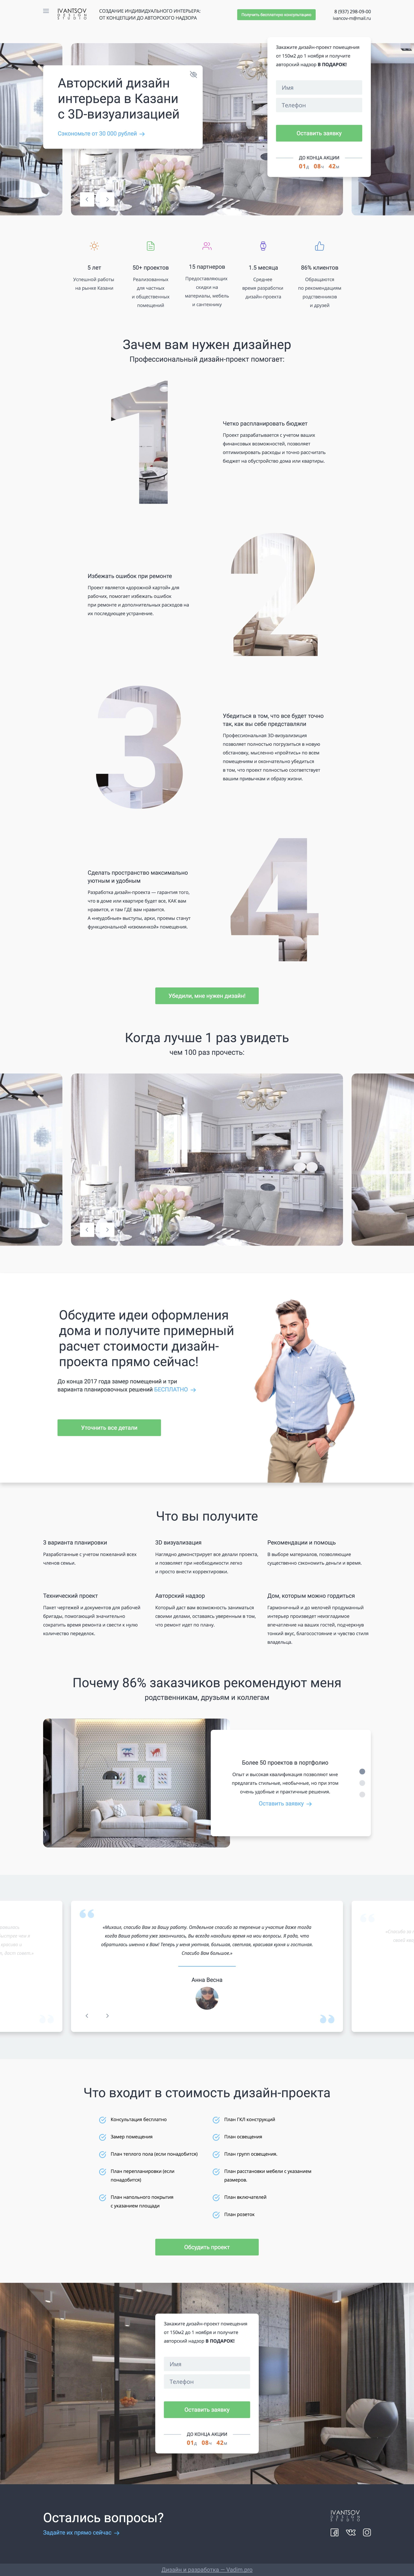 Ivantsov Design Studio Website Screenshot